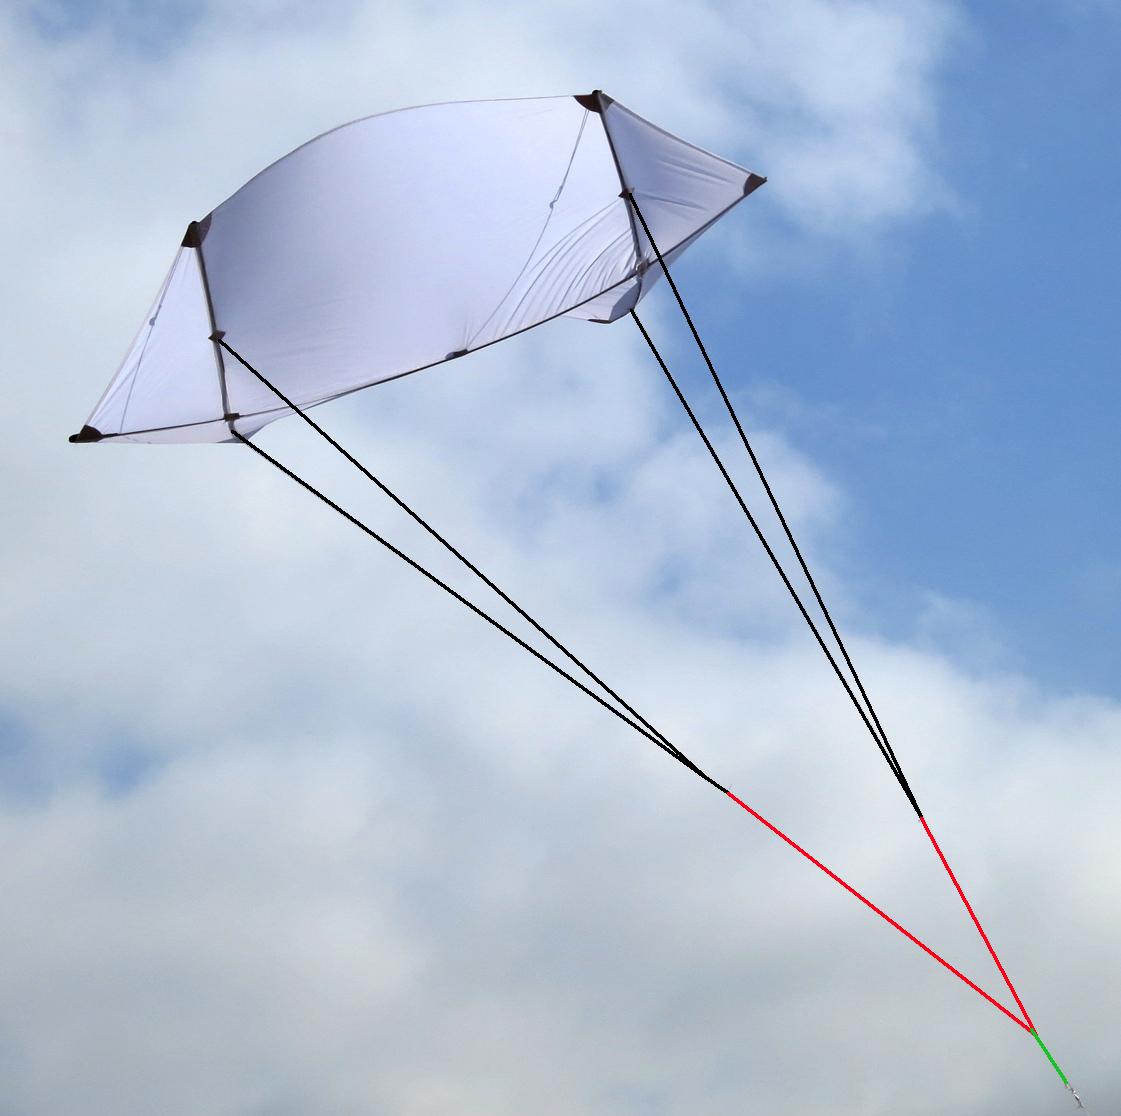 kite aerial photography kap by andrew newton